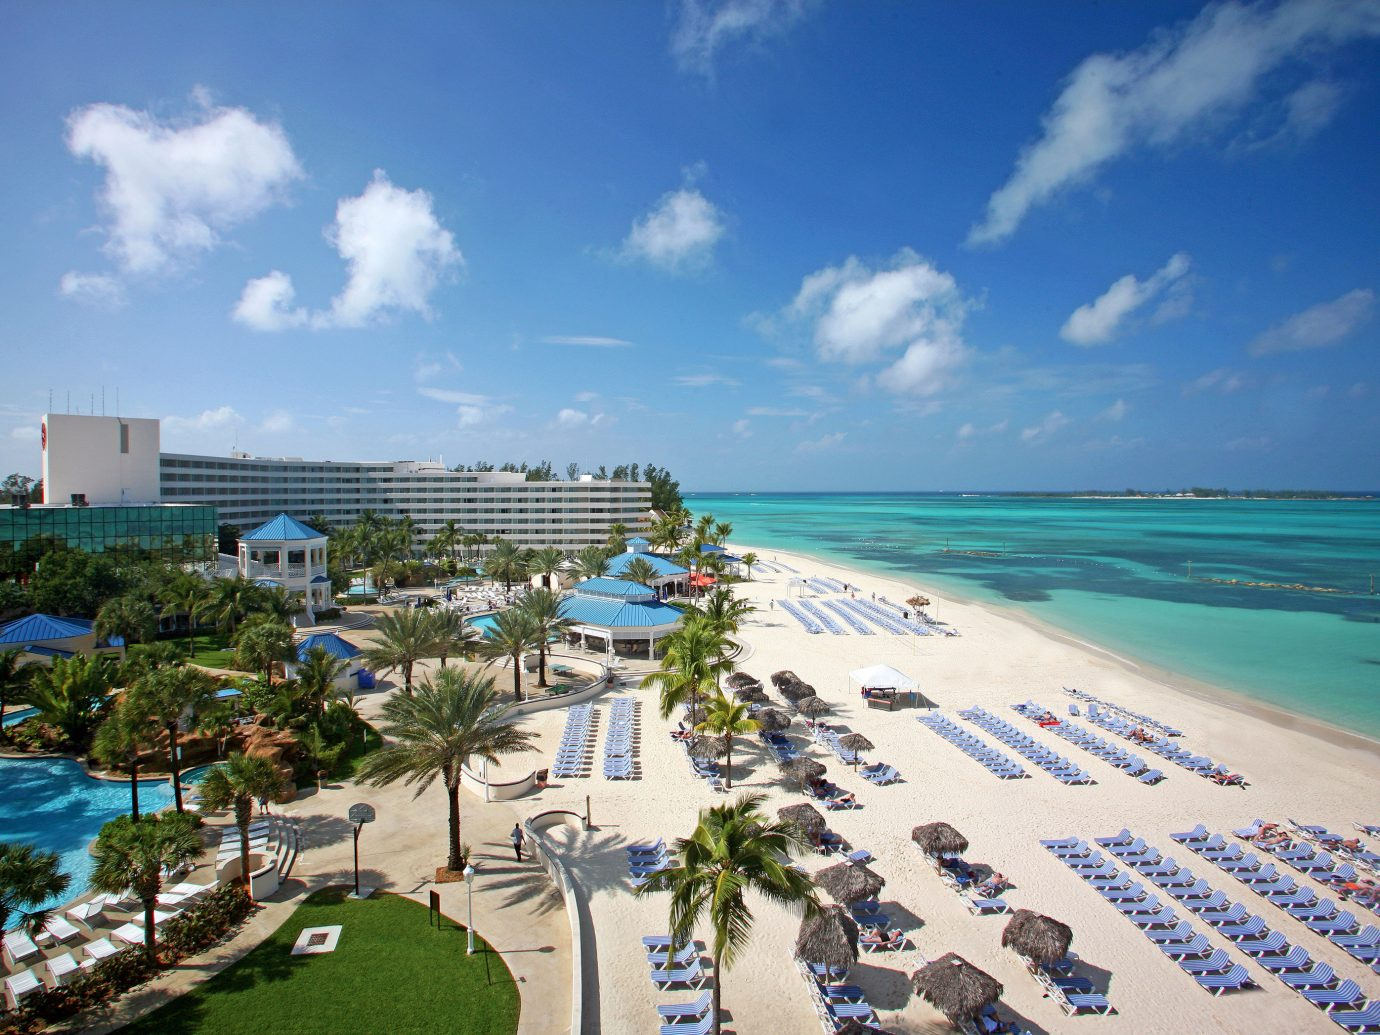 Hotels sky outdoor Beach Nature leisure caribbean vacation Resort Sea Ocean Coast bay cape shore day